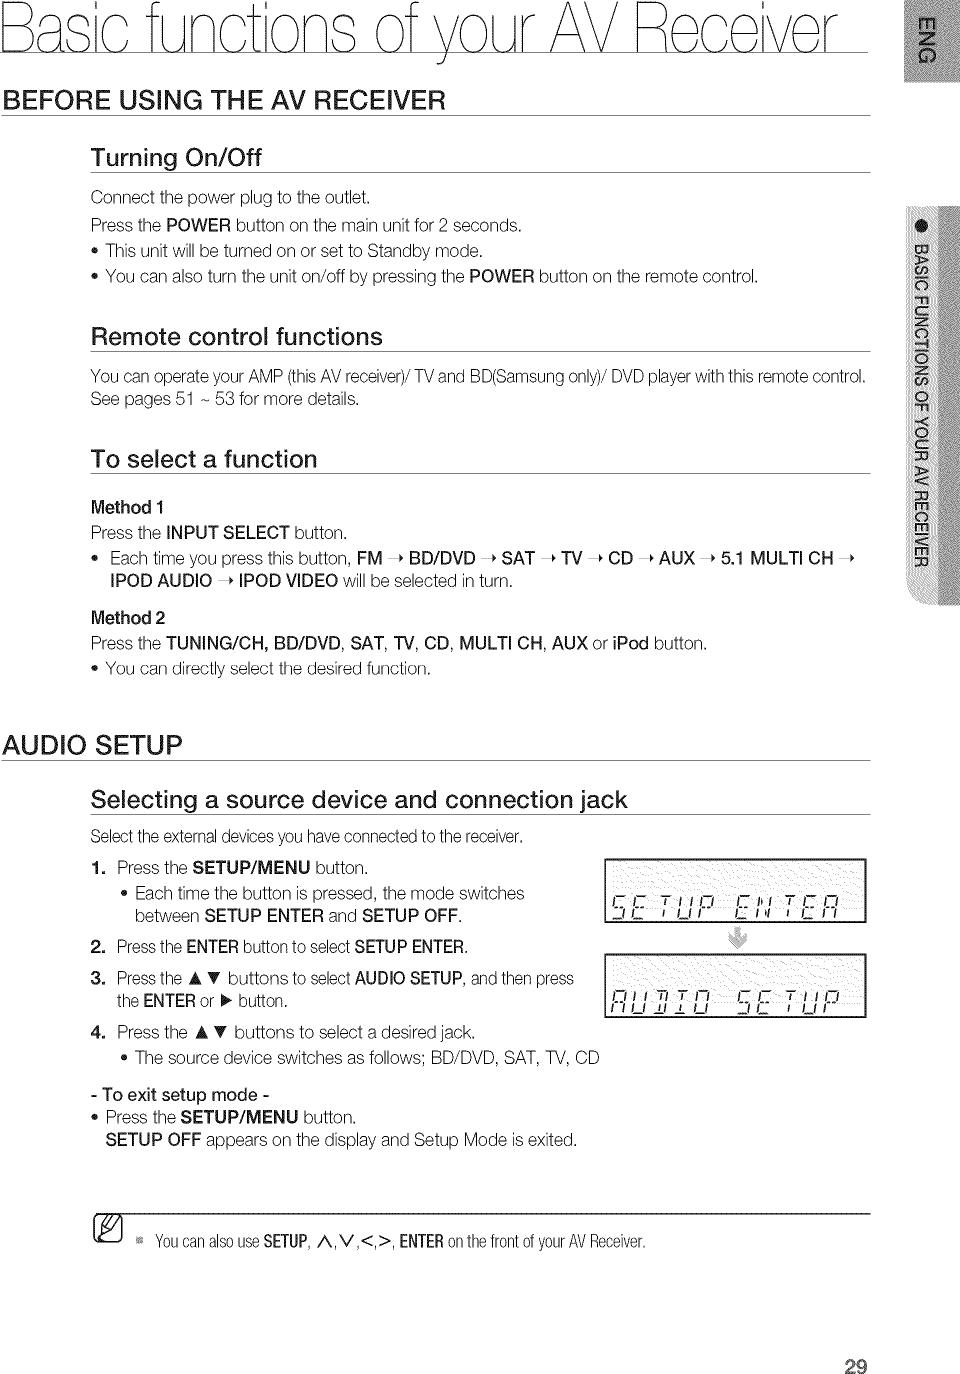 SAMSUNG Receivers Manual L1004096